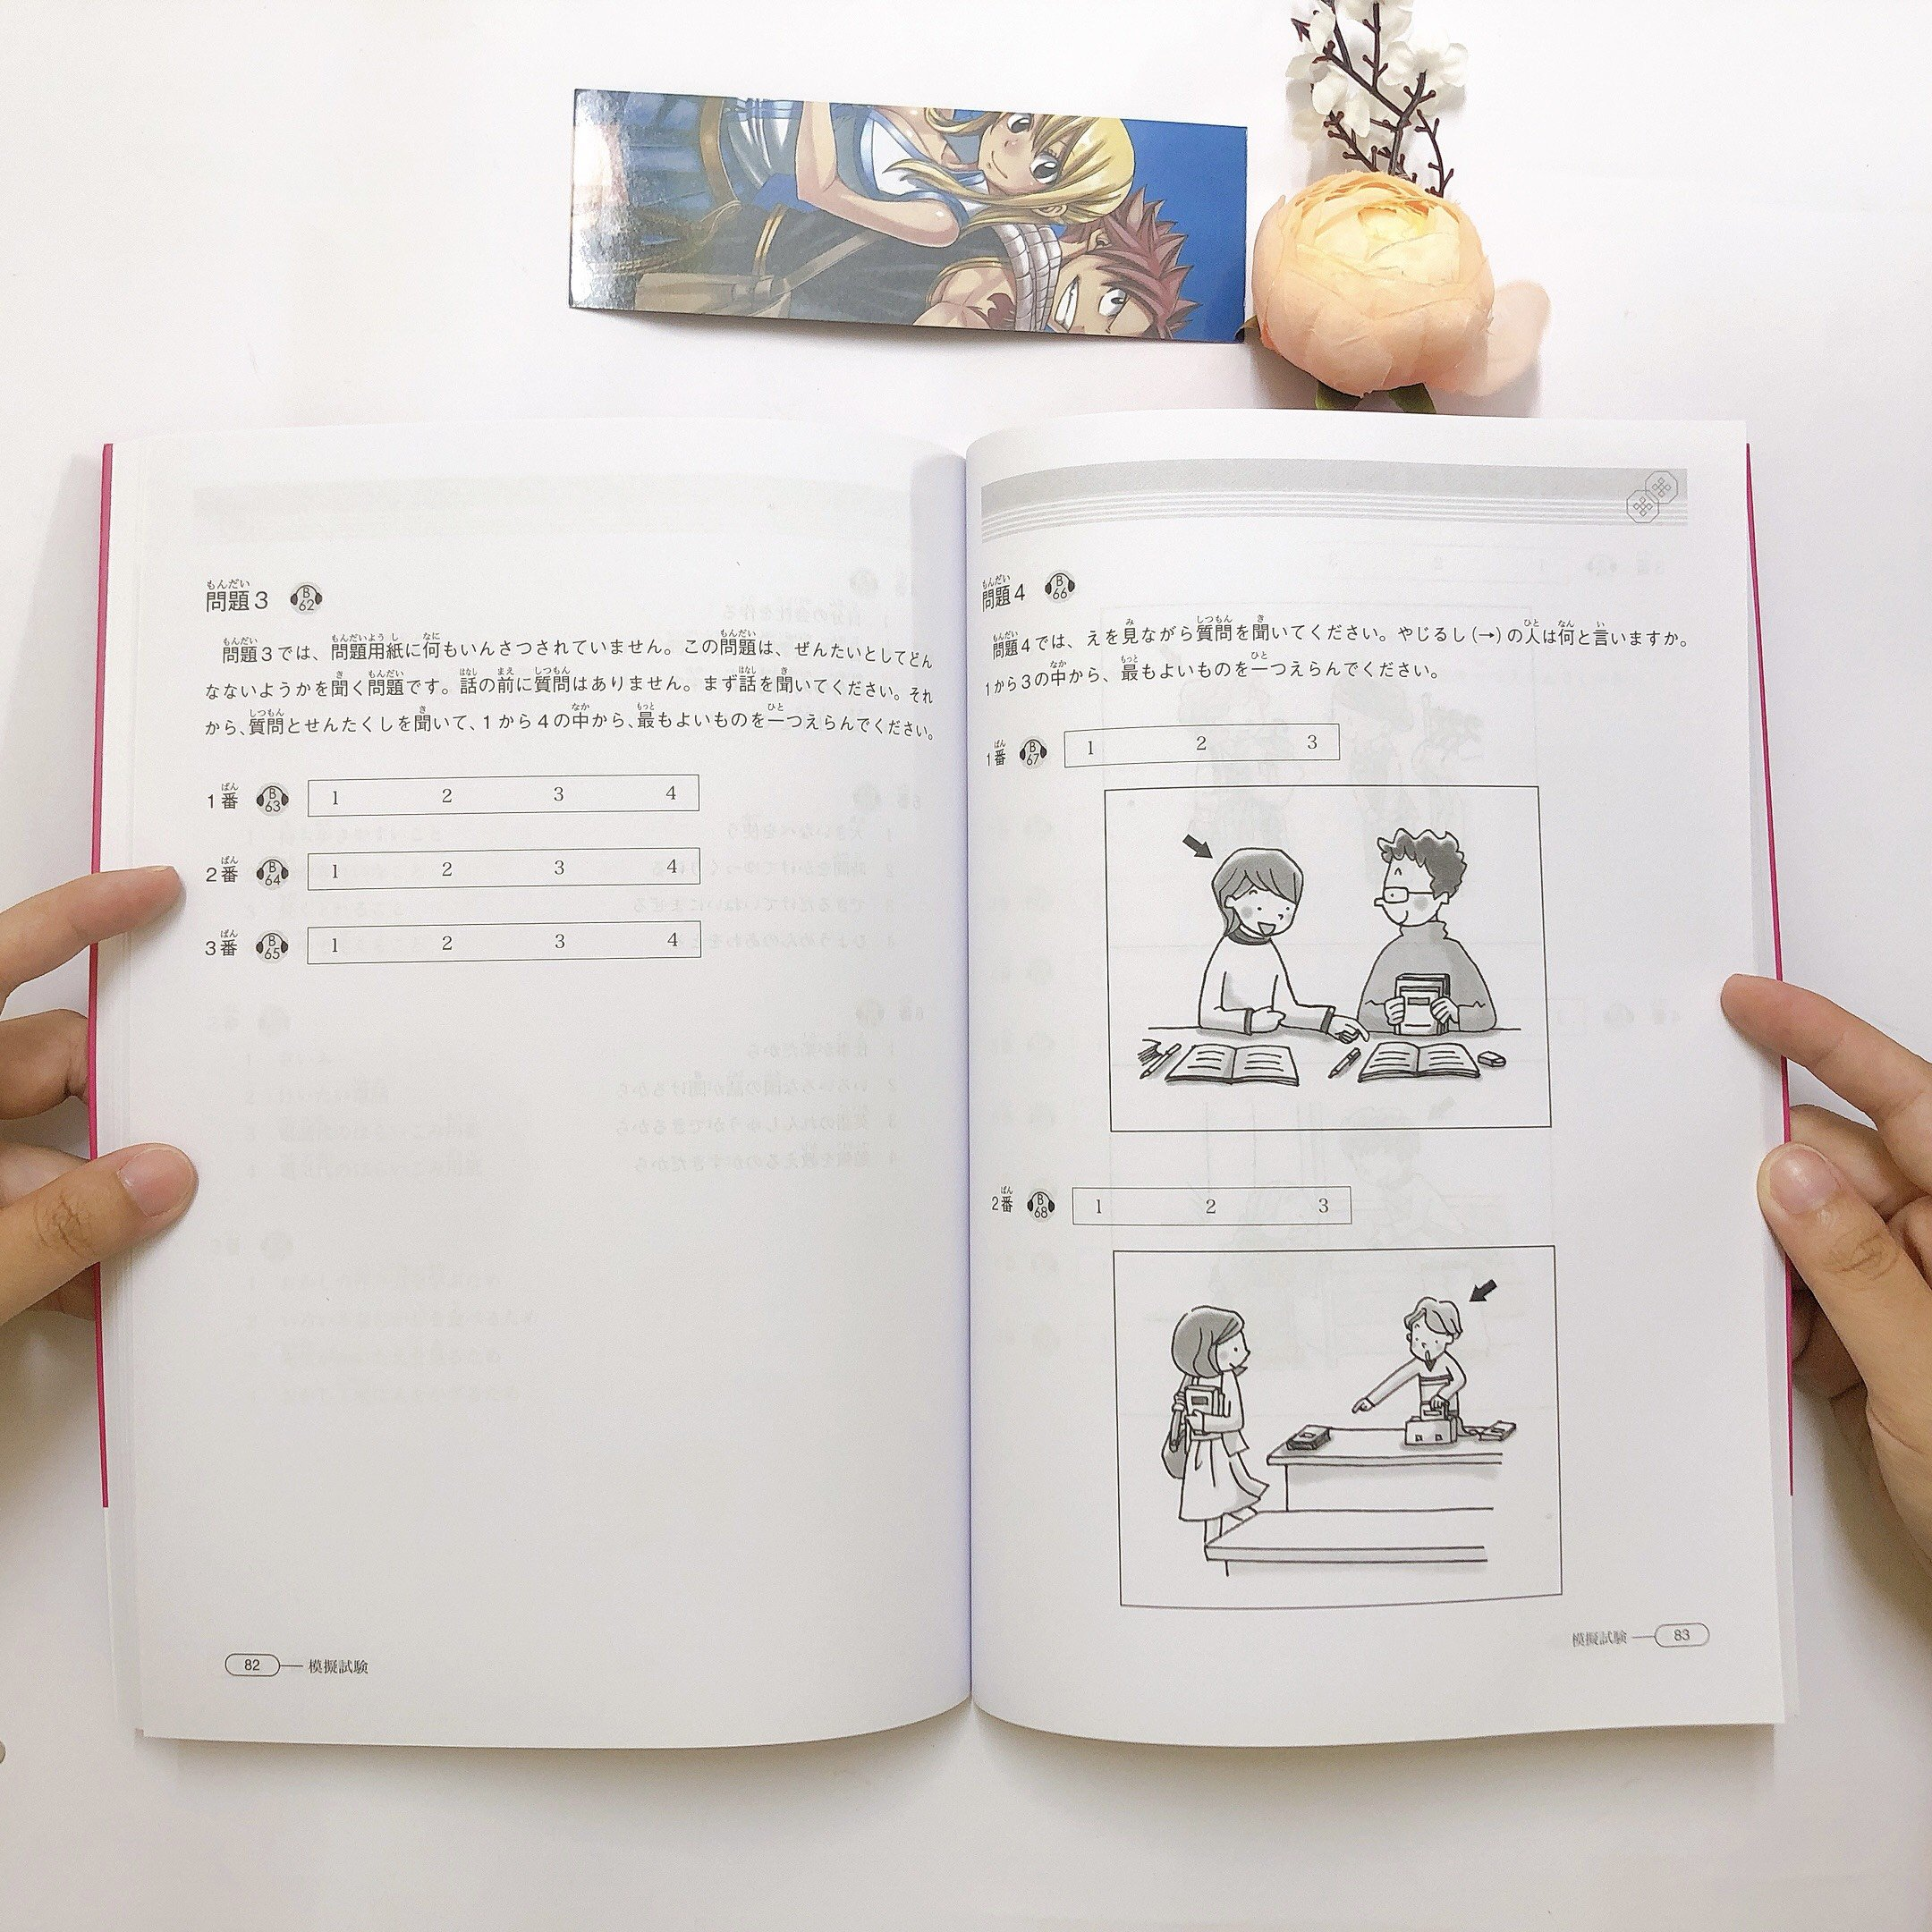 Shinkanzen master nghe n3 nội dung sách